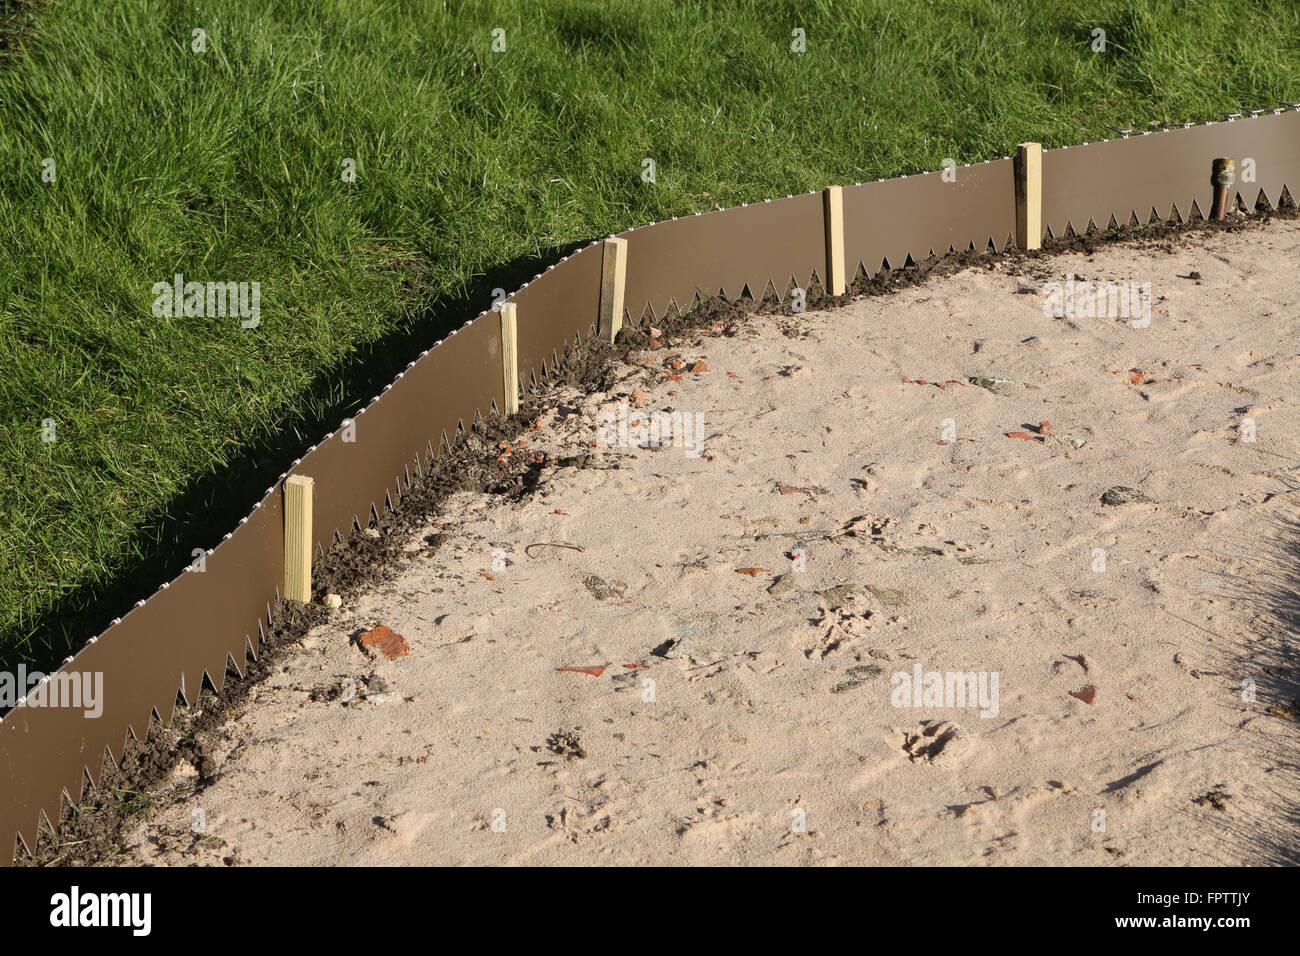 Laying New Garden Path - Lawn Edging Strip Surrey England - Stock Image